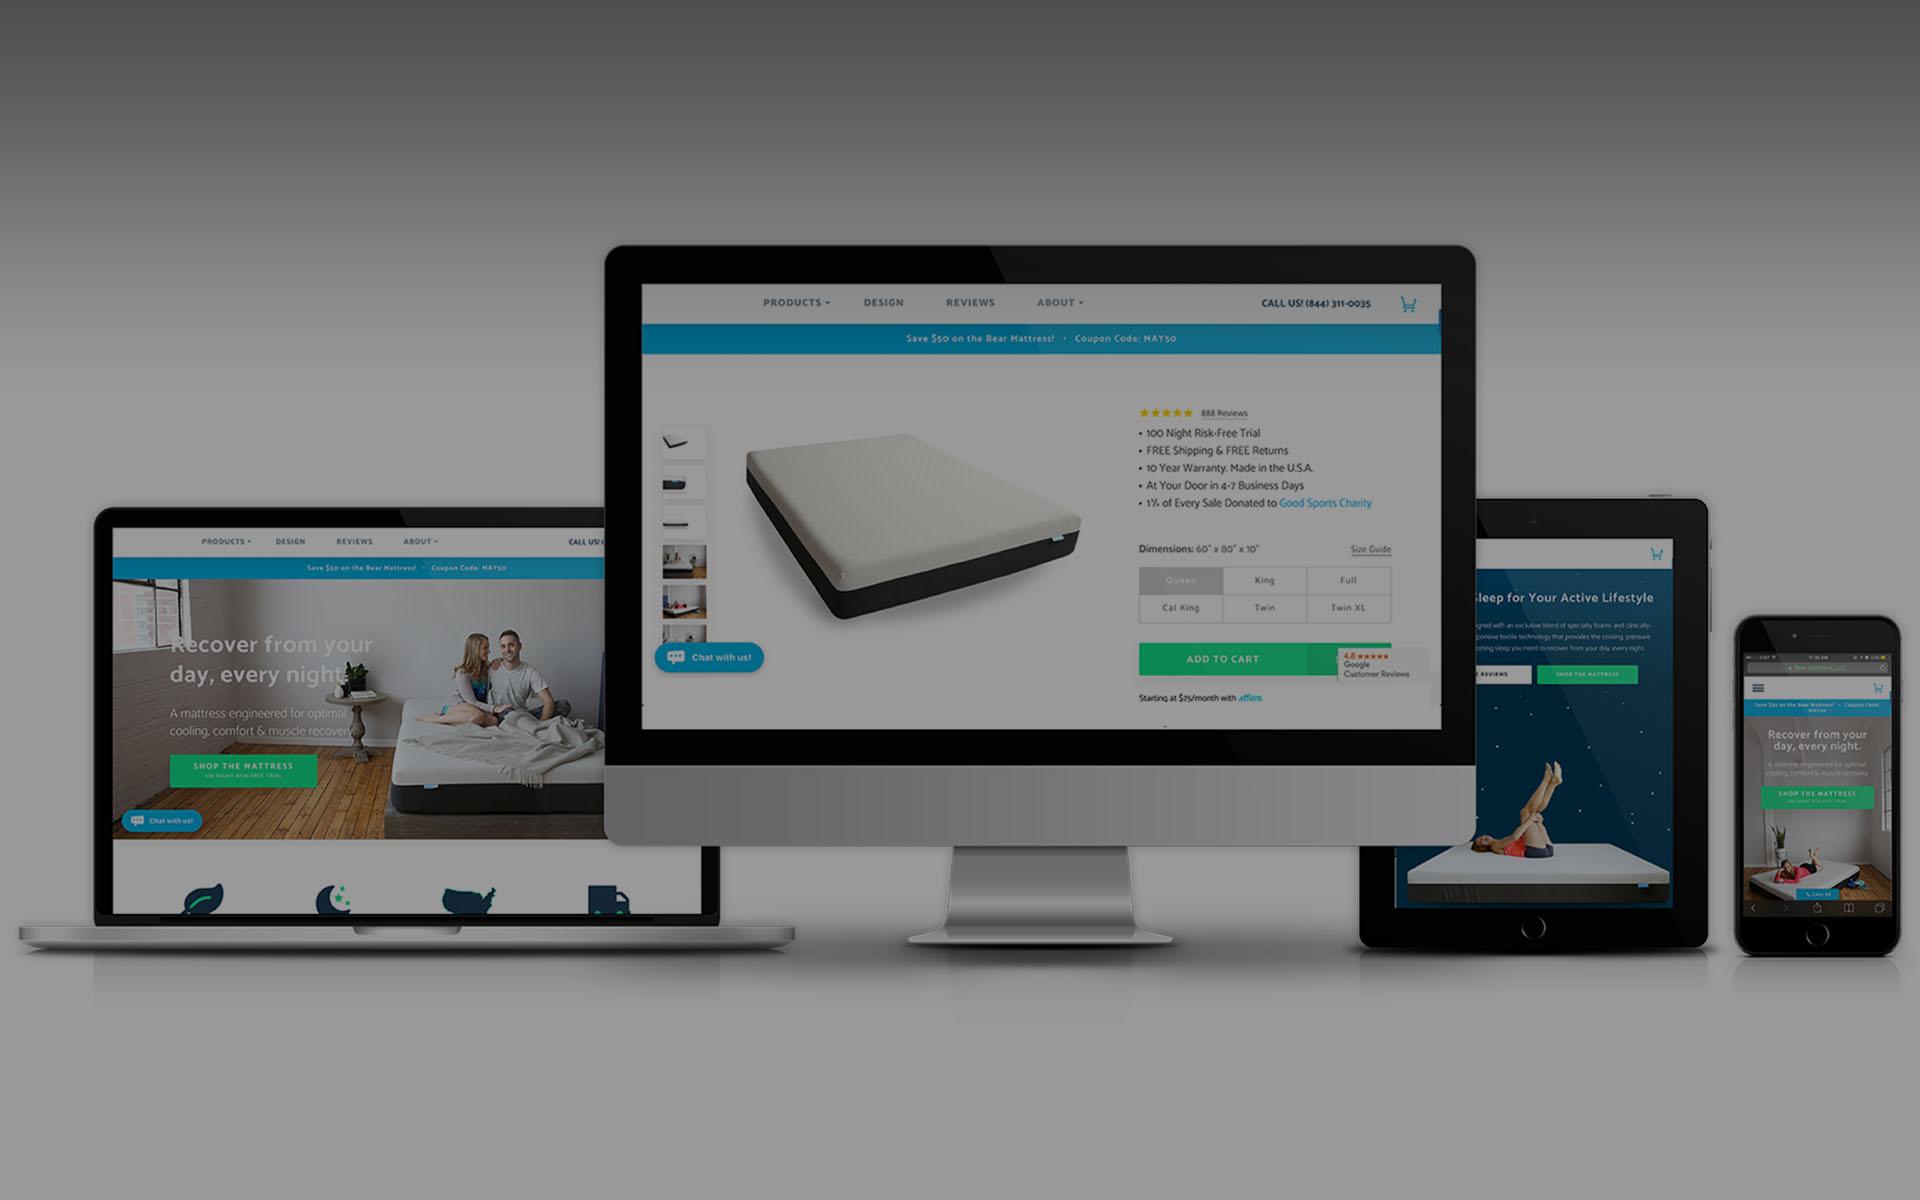 web design web developer studio alexsa capannoli pisa toscana